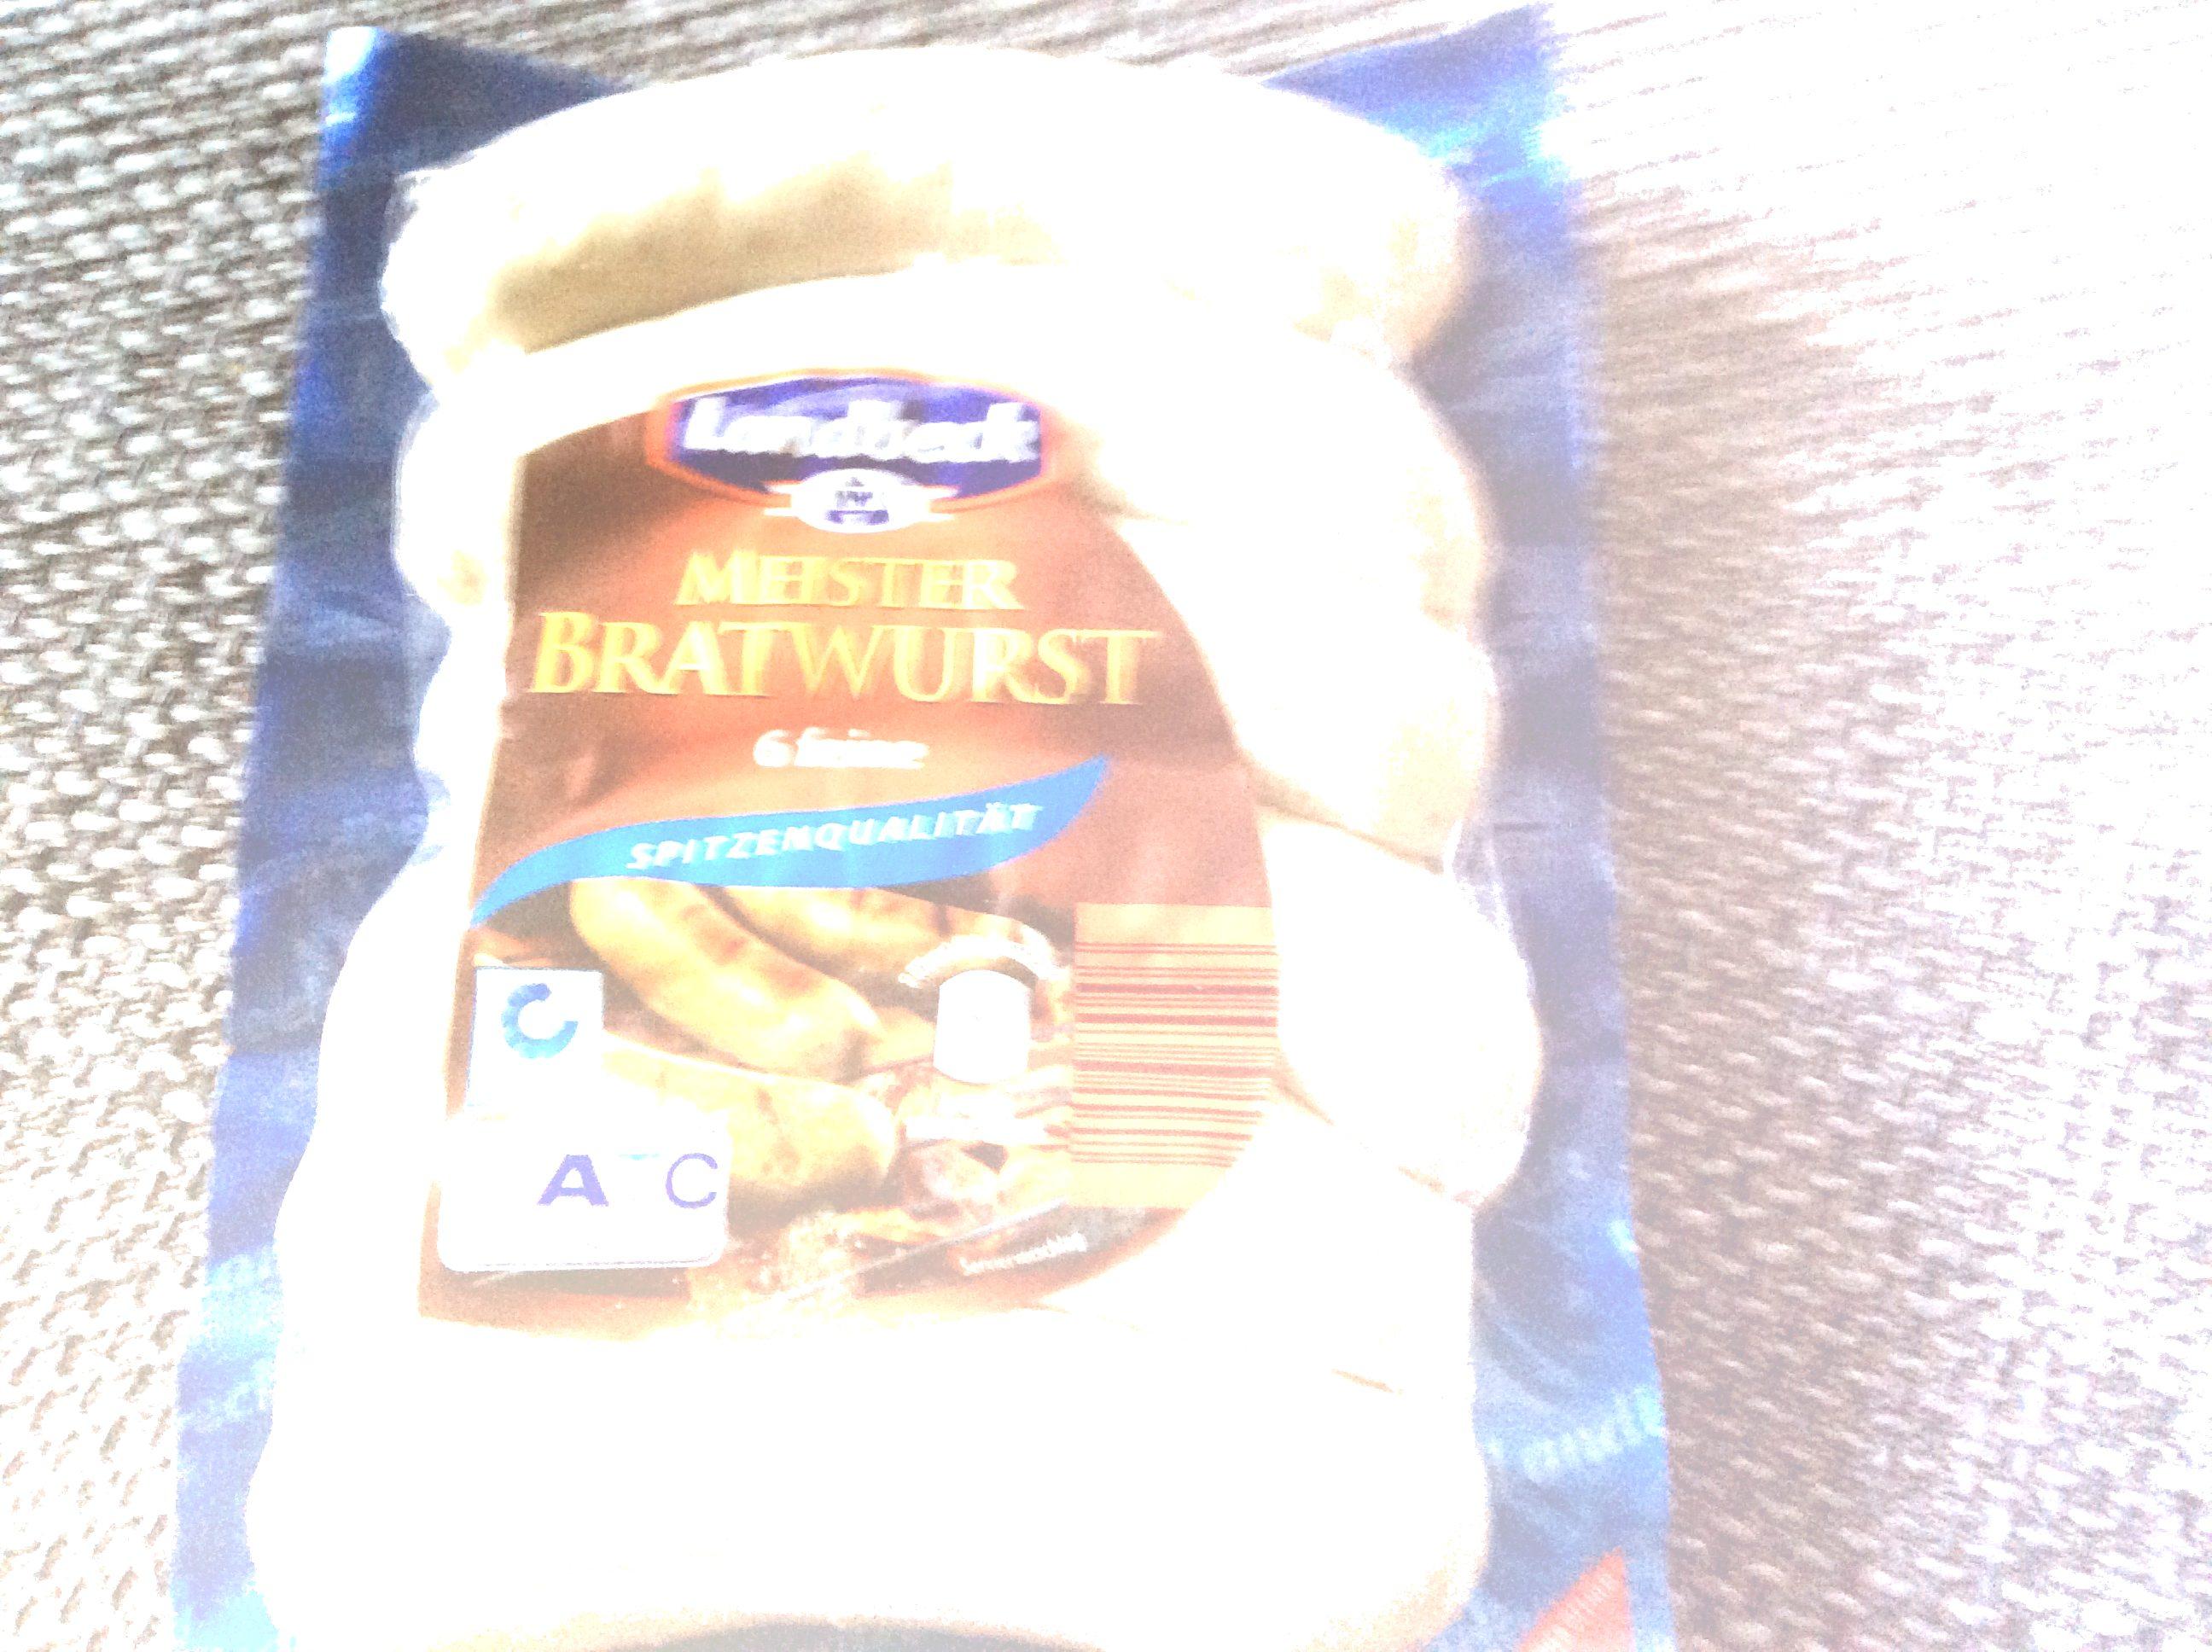 Meister Bratwurst - Product - de